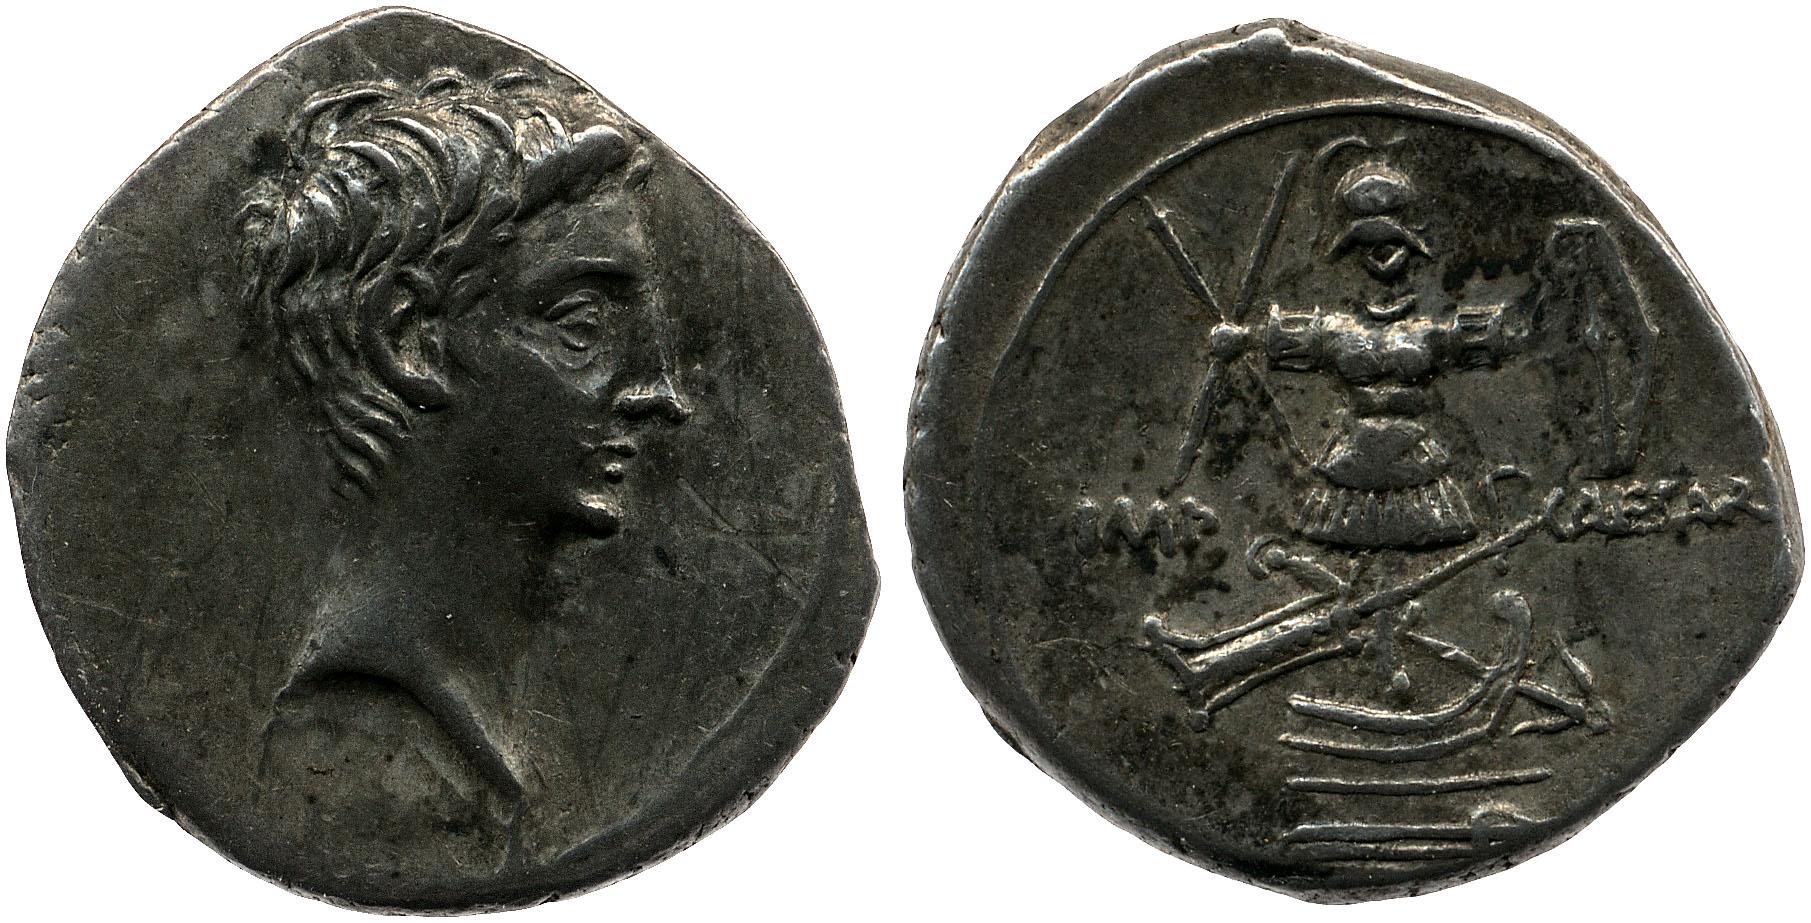 You are currently viewing 2018AU – Denier Octave – Caius Julius Cæsar Octavianus